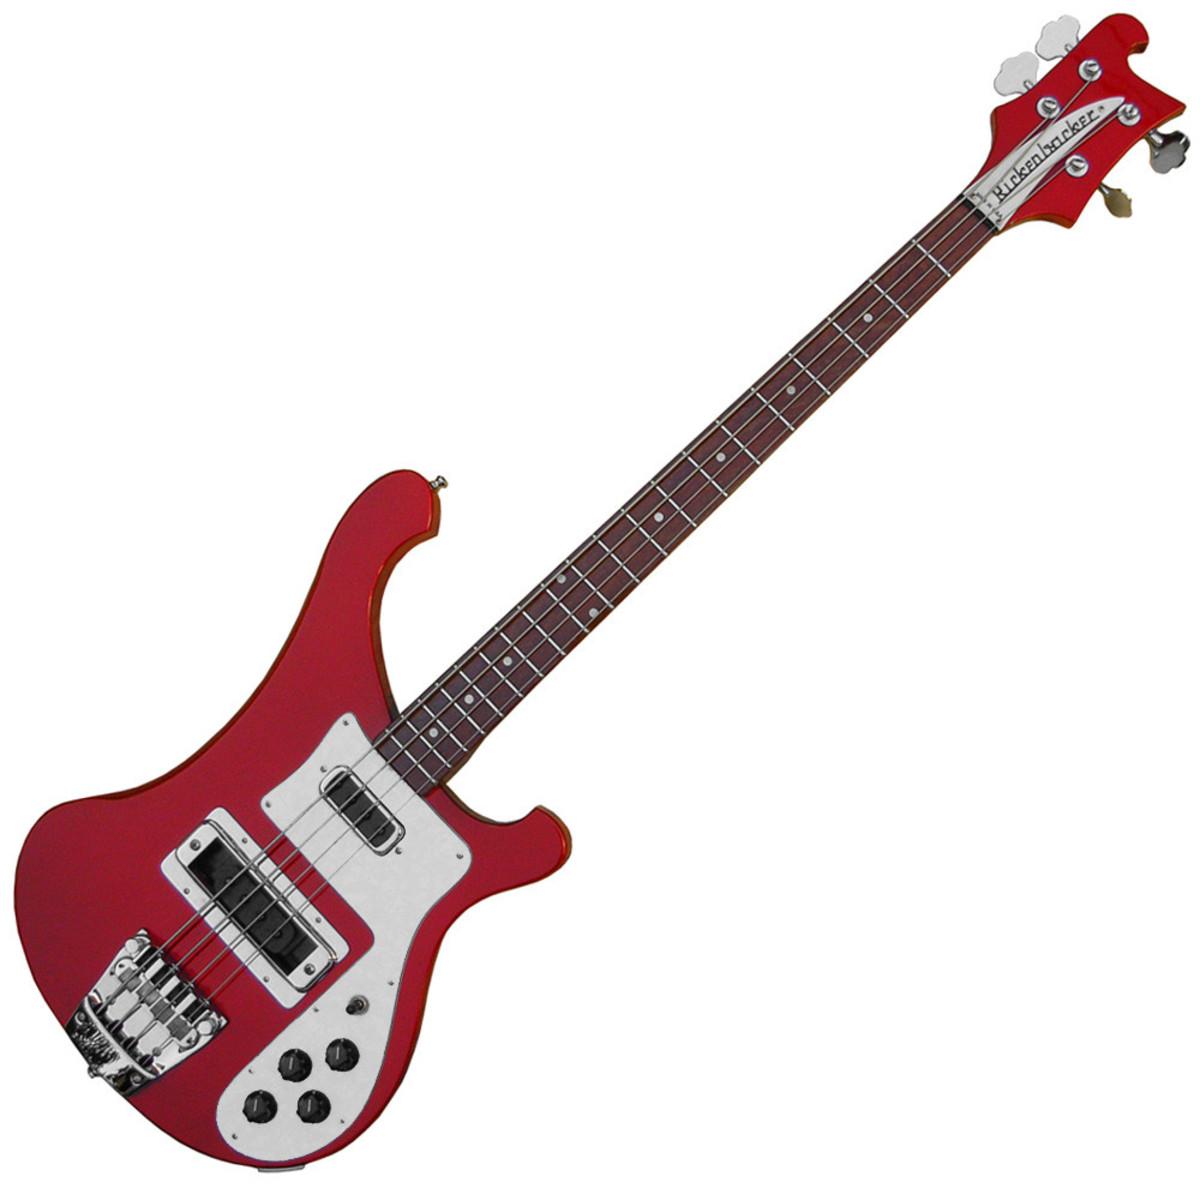 rickenbacker 4003s bass guitar ruby at. Black Bedroom Furniture Sets. Home Design Ideas